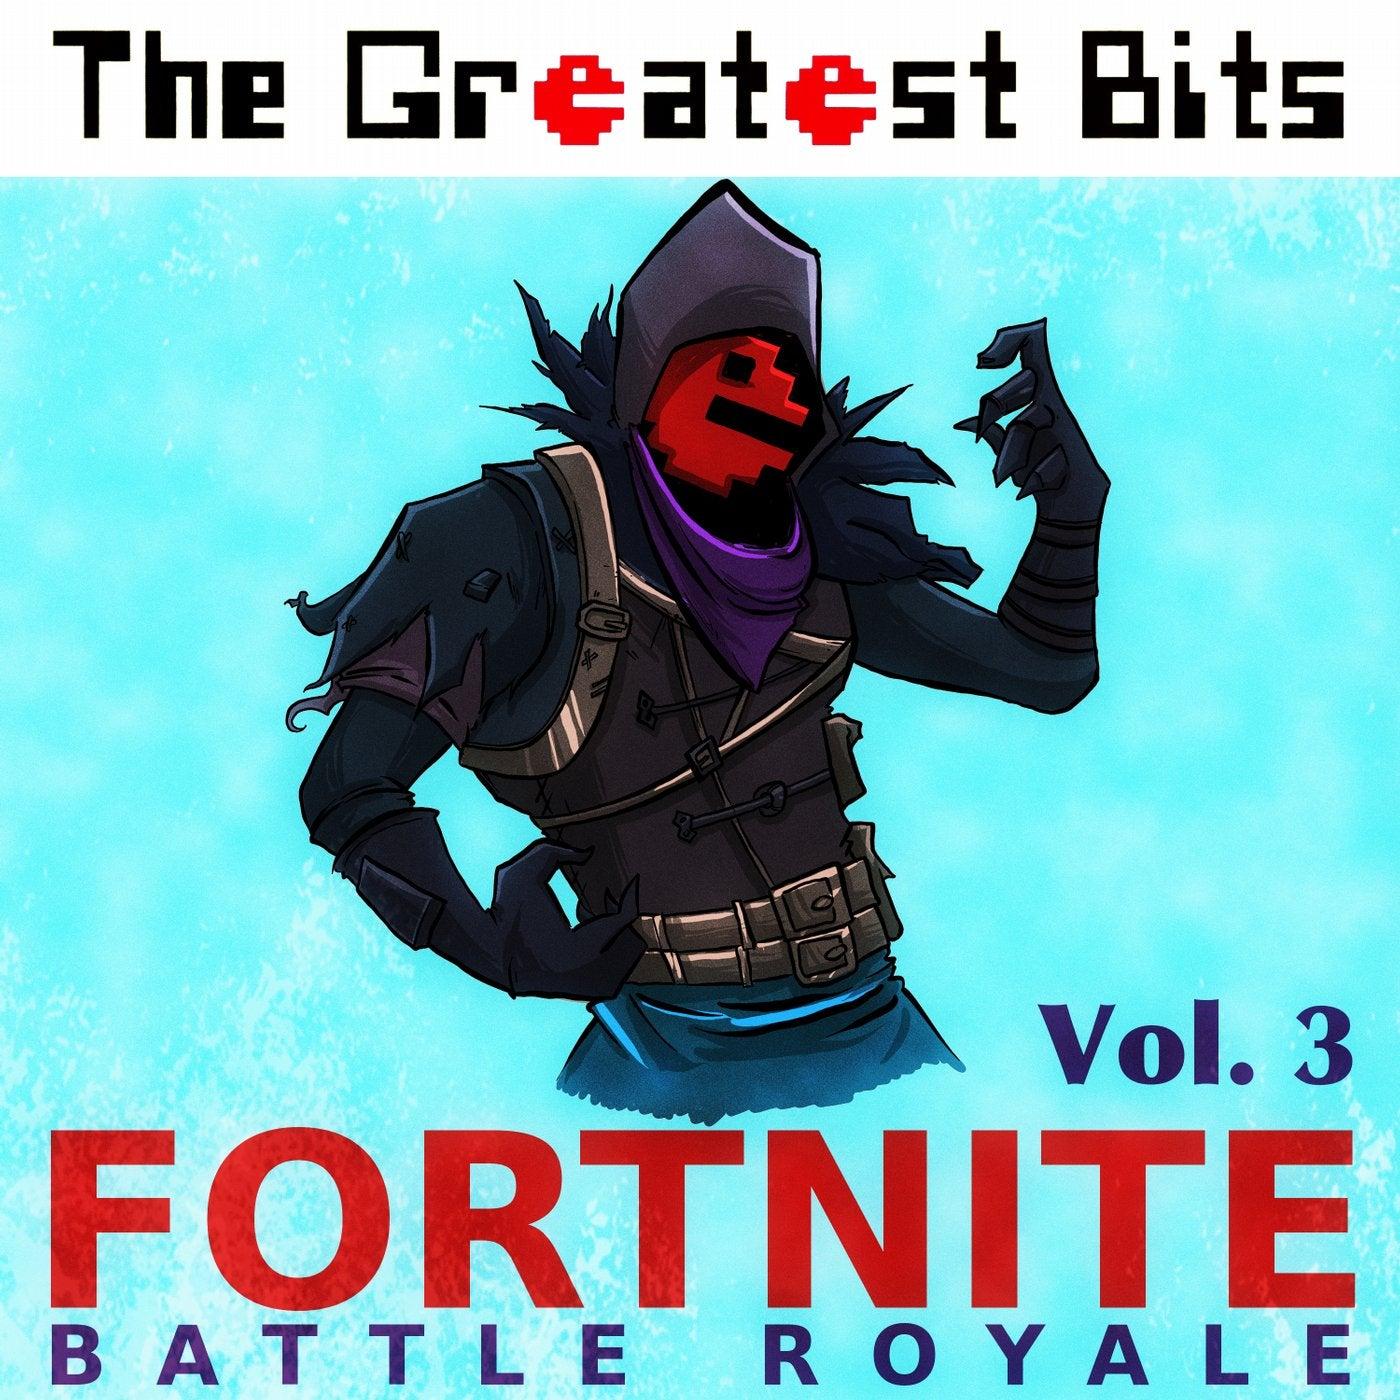 Fortnite Dances On Guitar Guitar Walk Dance Emote From Fortnite Battle Royale Original Mix By The Greatest Bits On Beatport